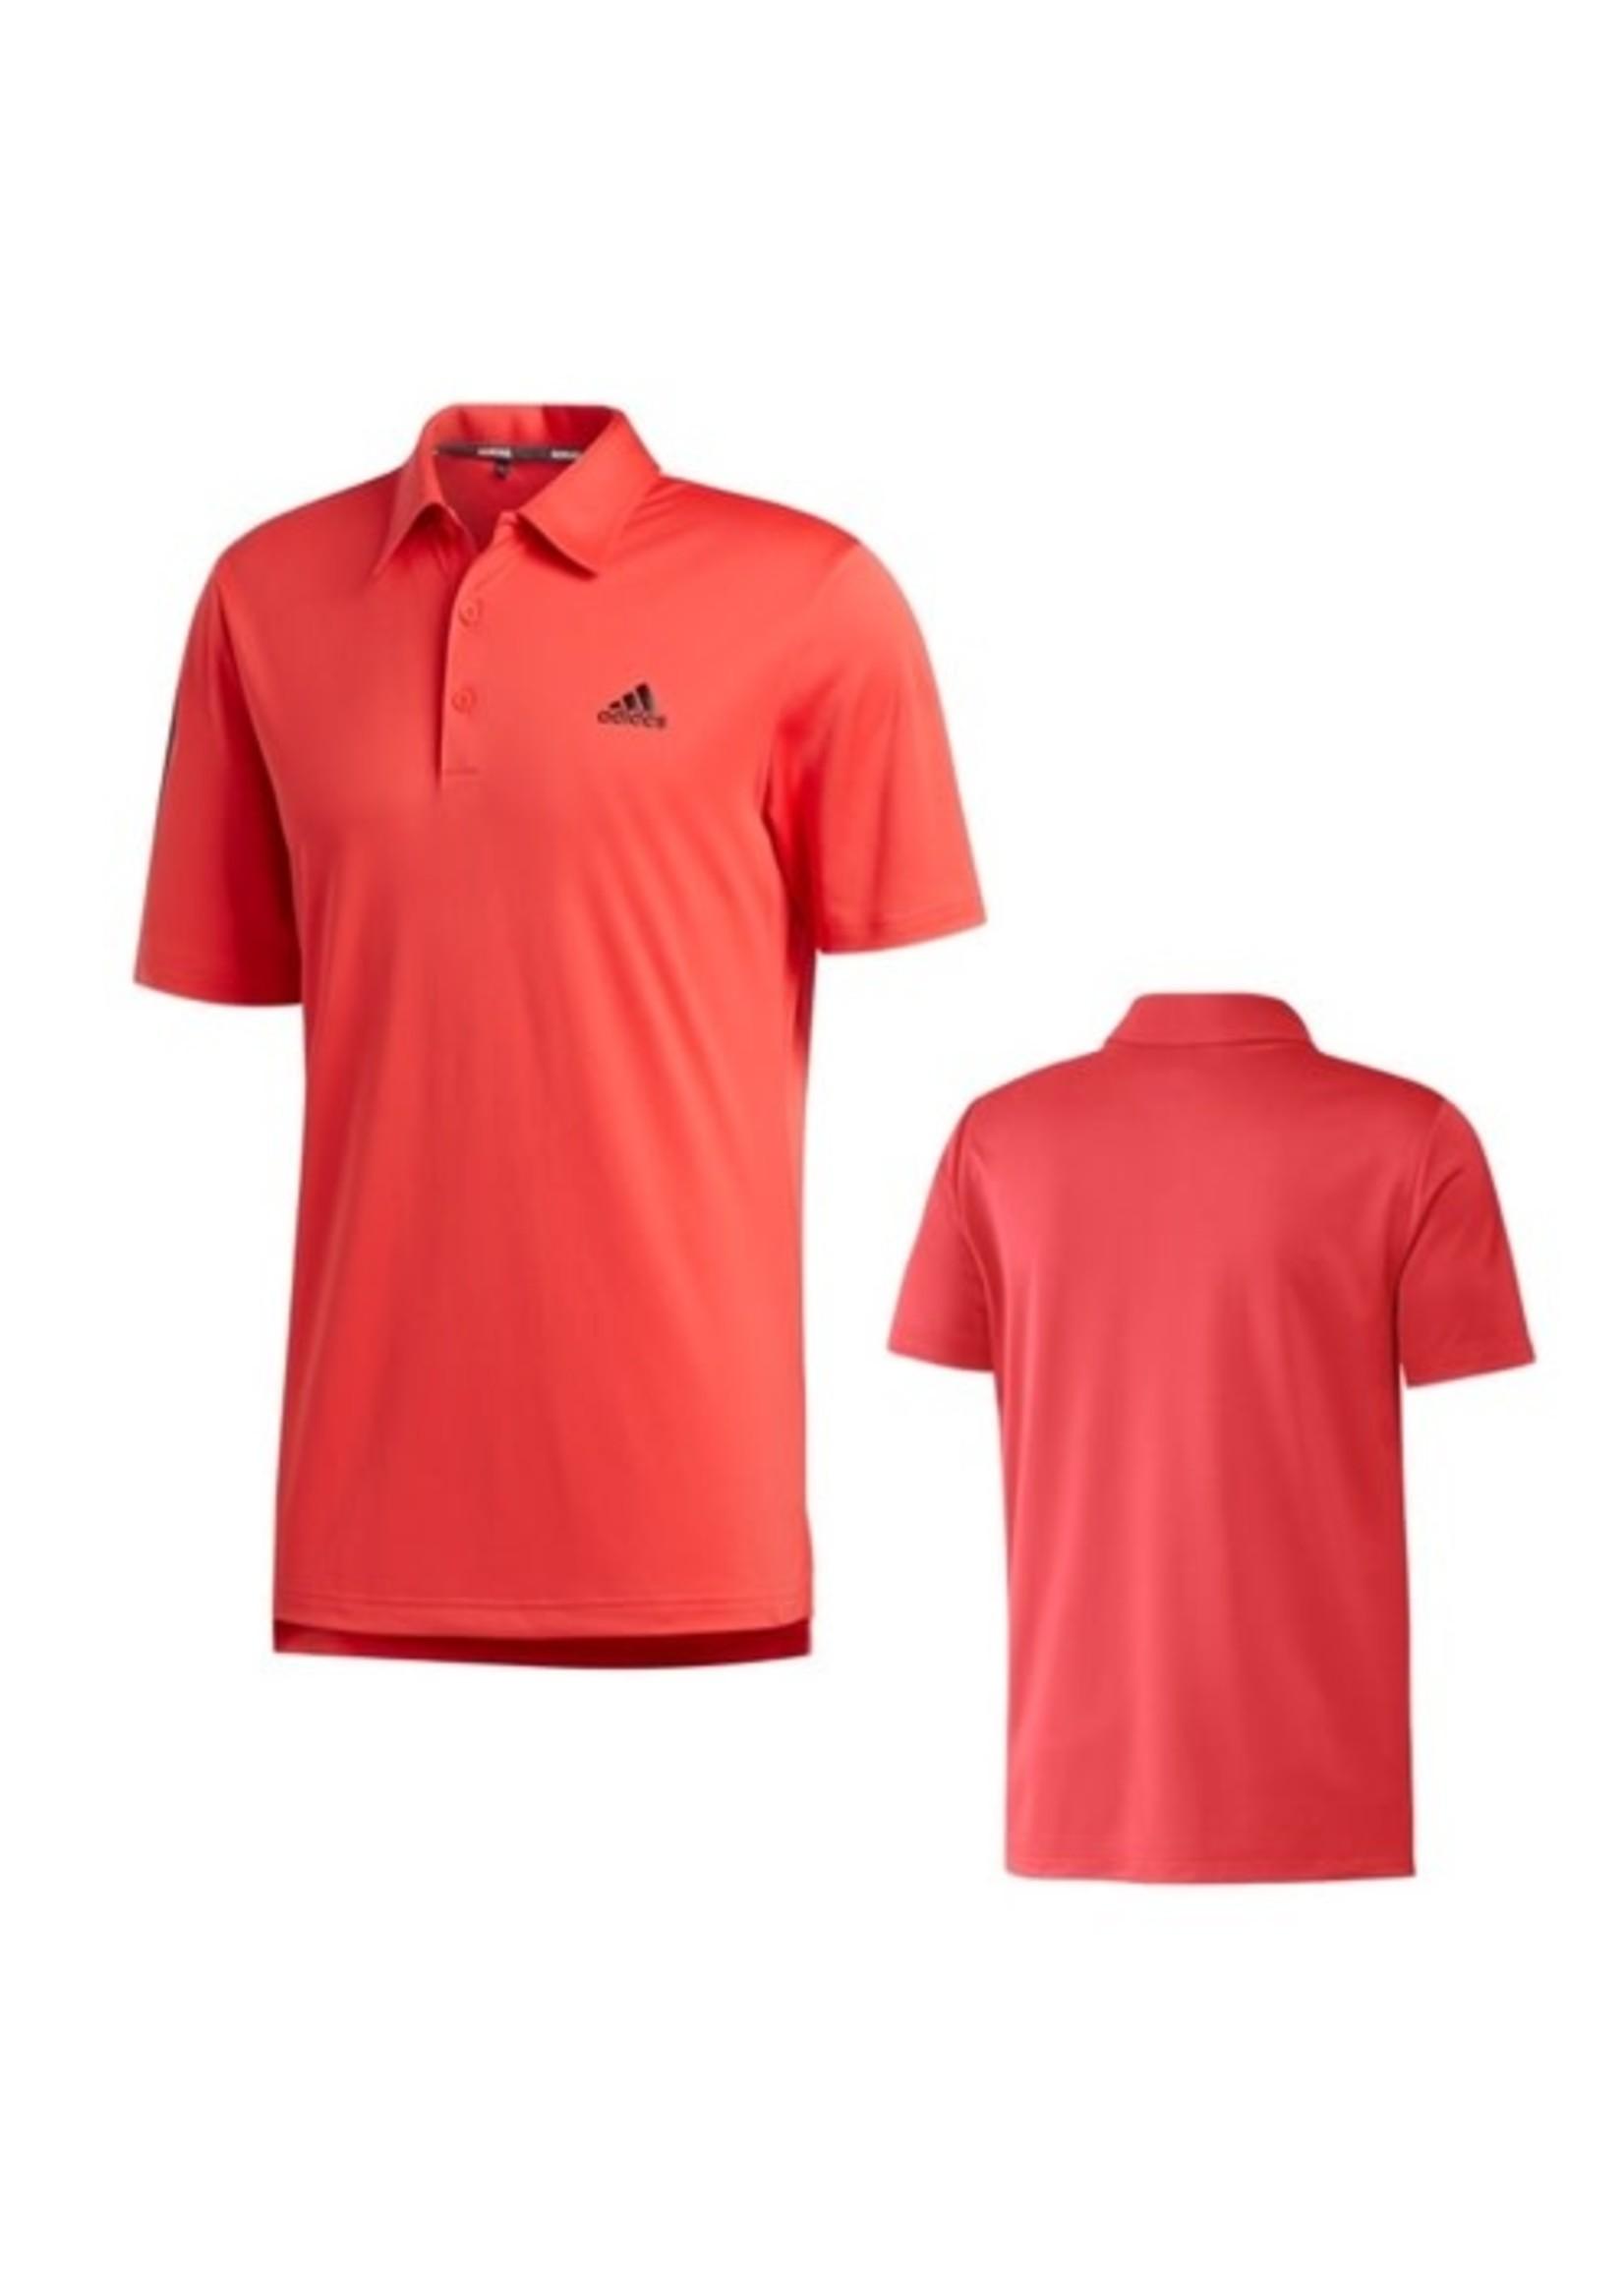 Adidas Adidas 3 Stripe Basic Mens Polo (2020)